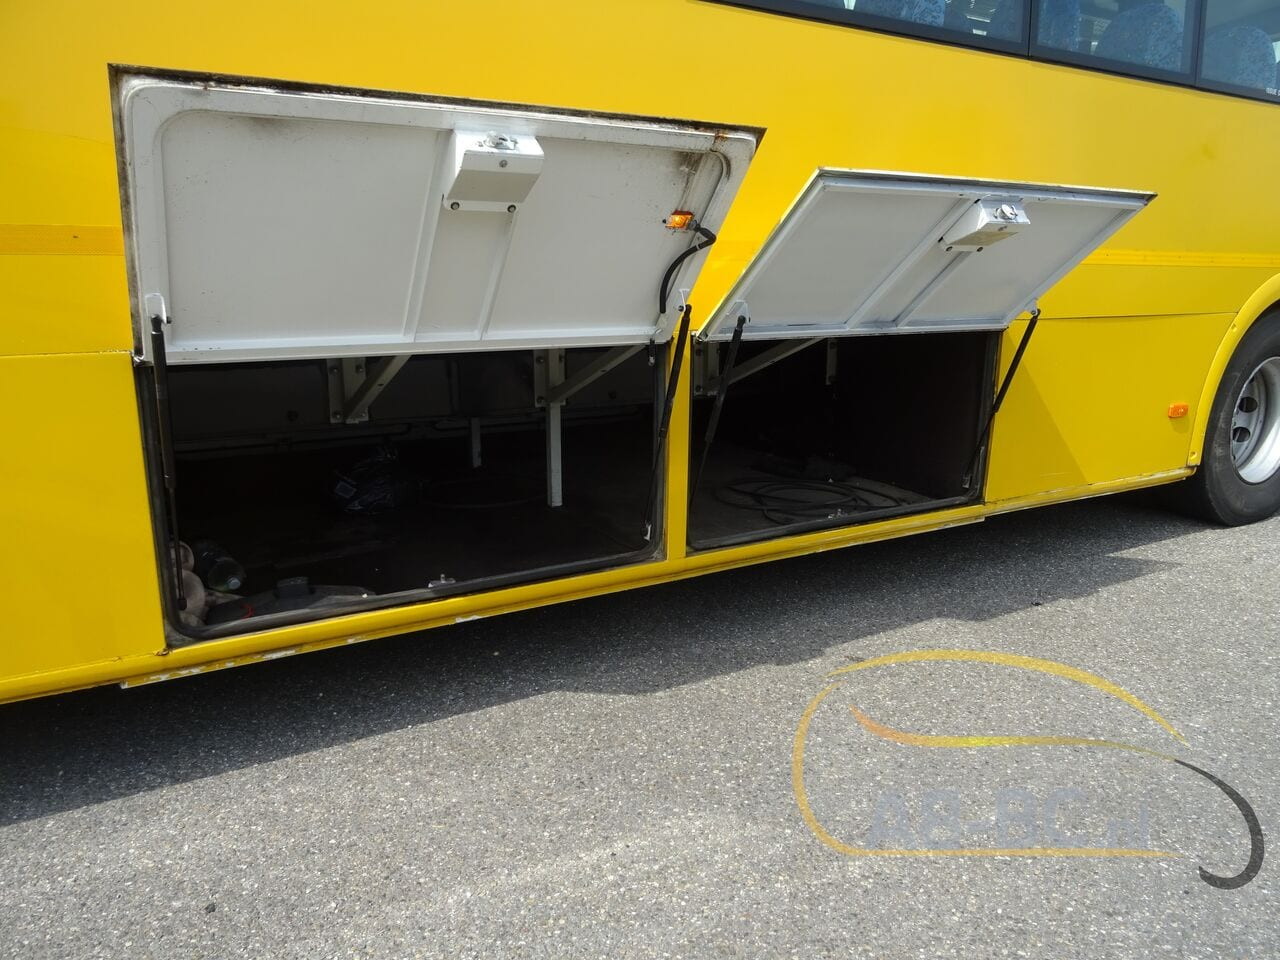 interurban-busMAN-Fast-64-seats---1619619795436097565_big_480ba2d220c595877b2bc4e21600355e--21042817163019598600